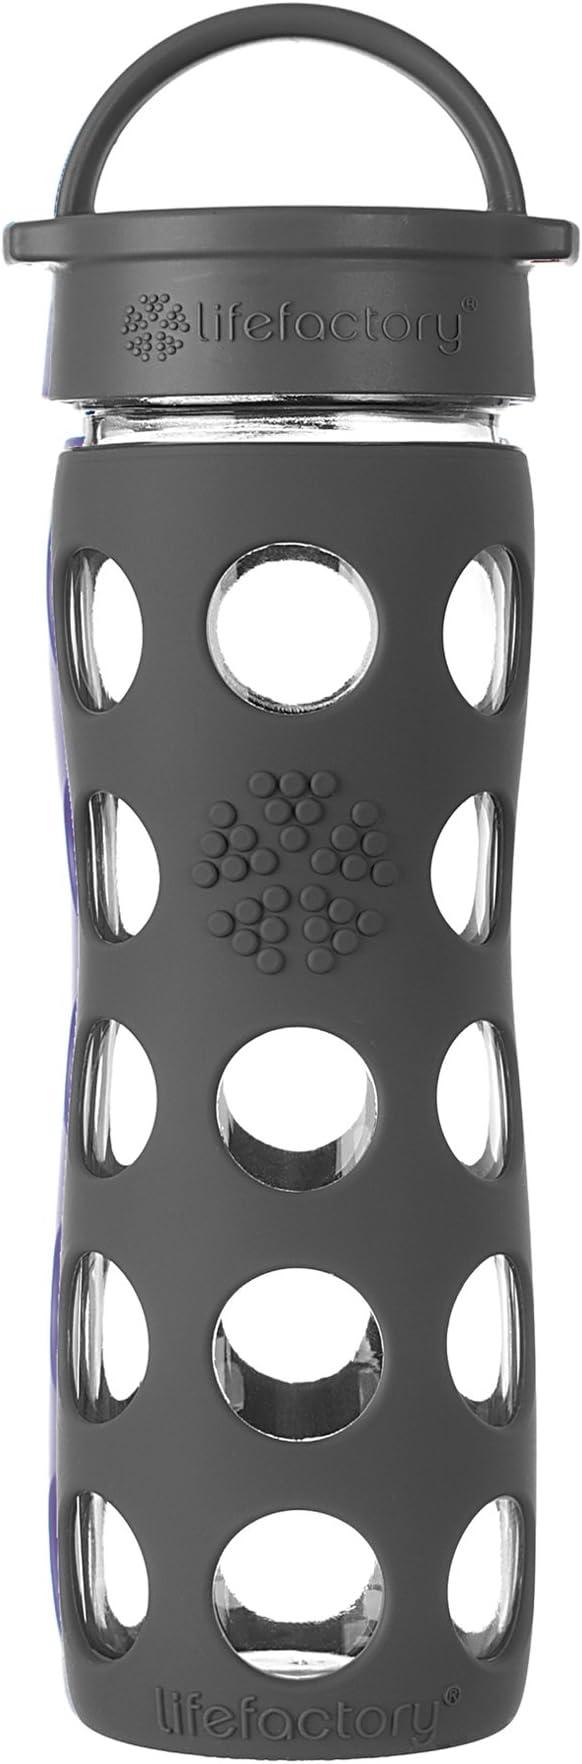 Lifefactory – Botella con Classic Cap, Vidrio, Huckleberry, 22 oz ...